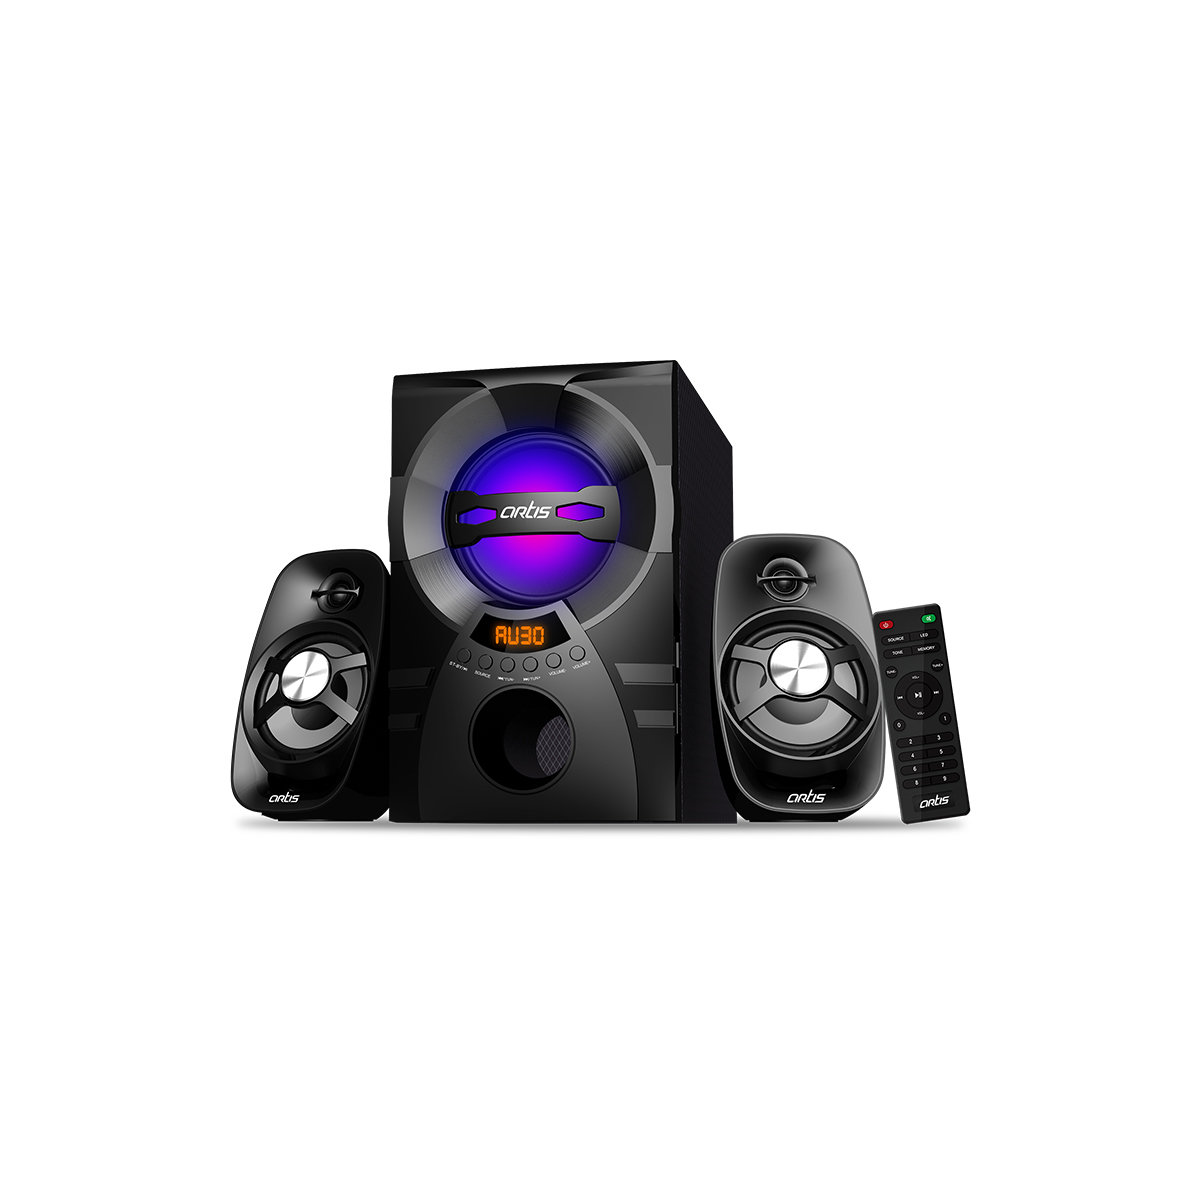 Artis Ms304 2 1 Ch Wireless Multimedia Speaker System Rs